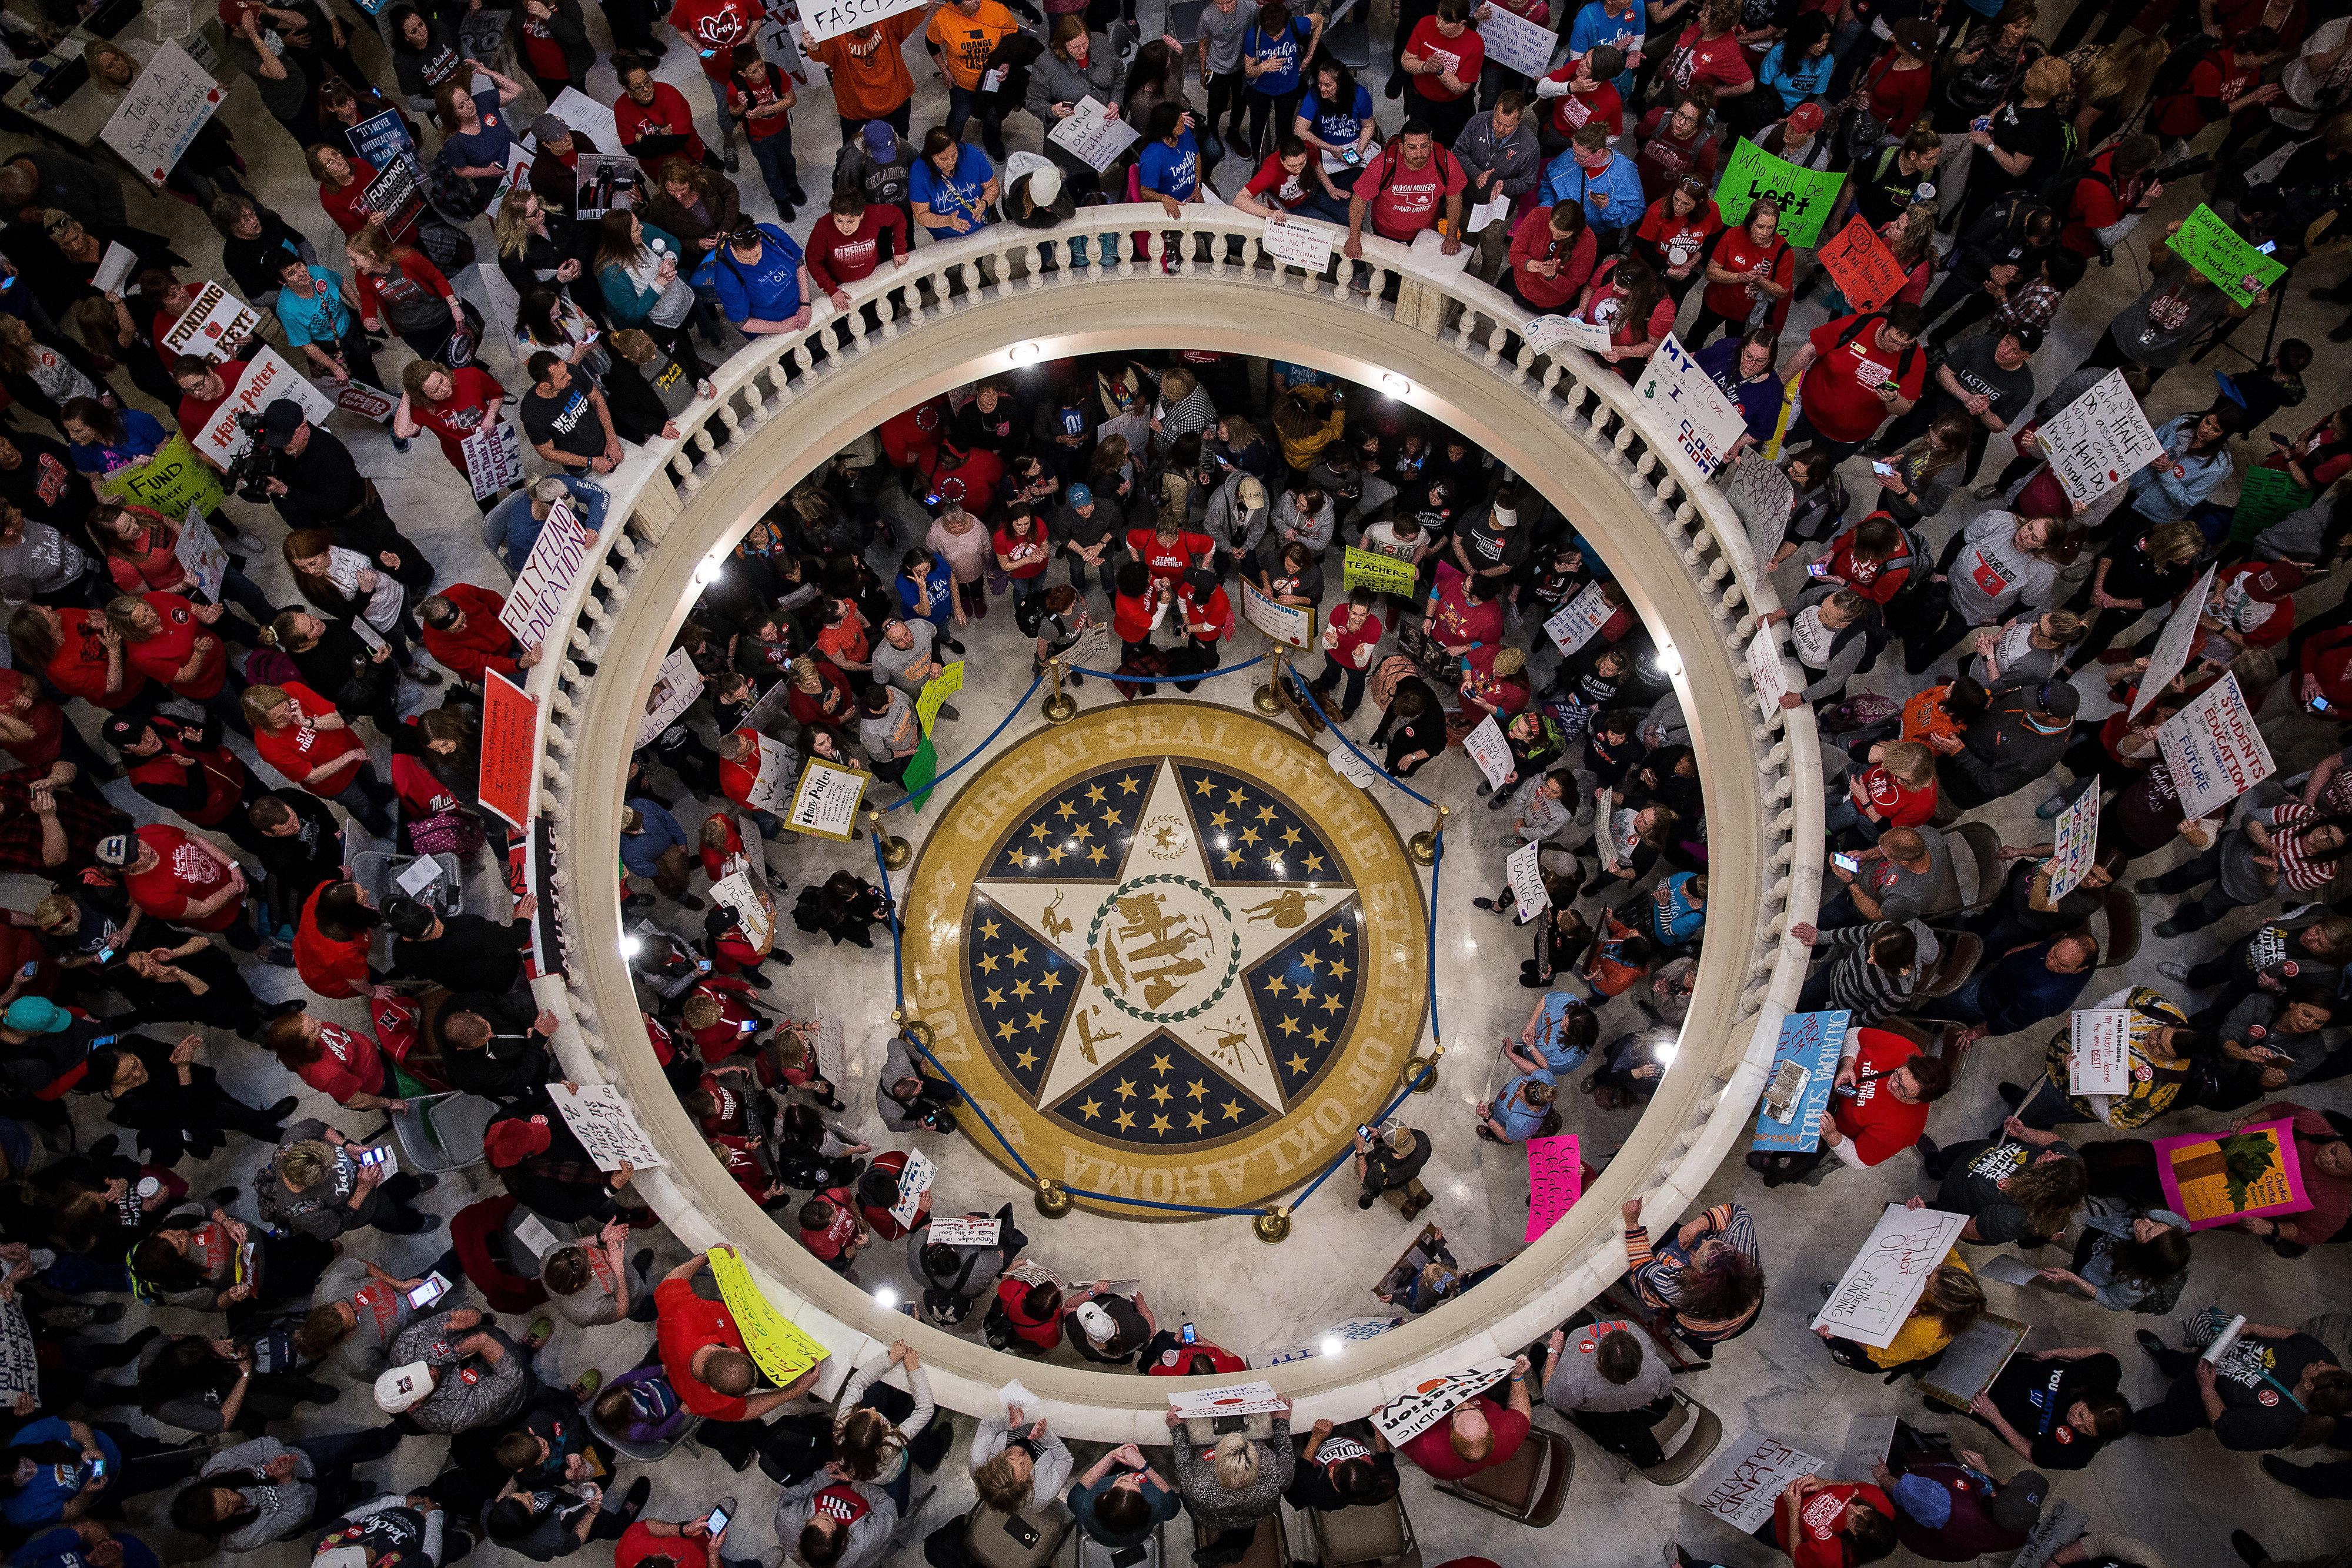 Teachersdemand increasedpublic school funding in the state Capitol in Oklahoma City on April 3.